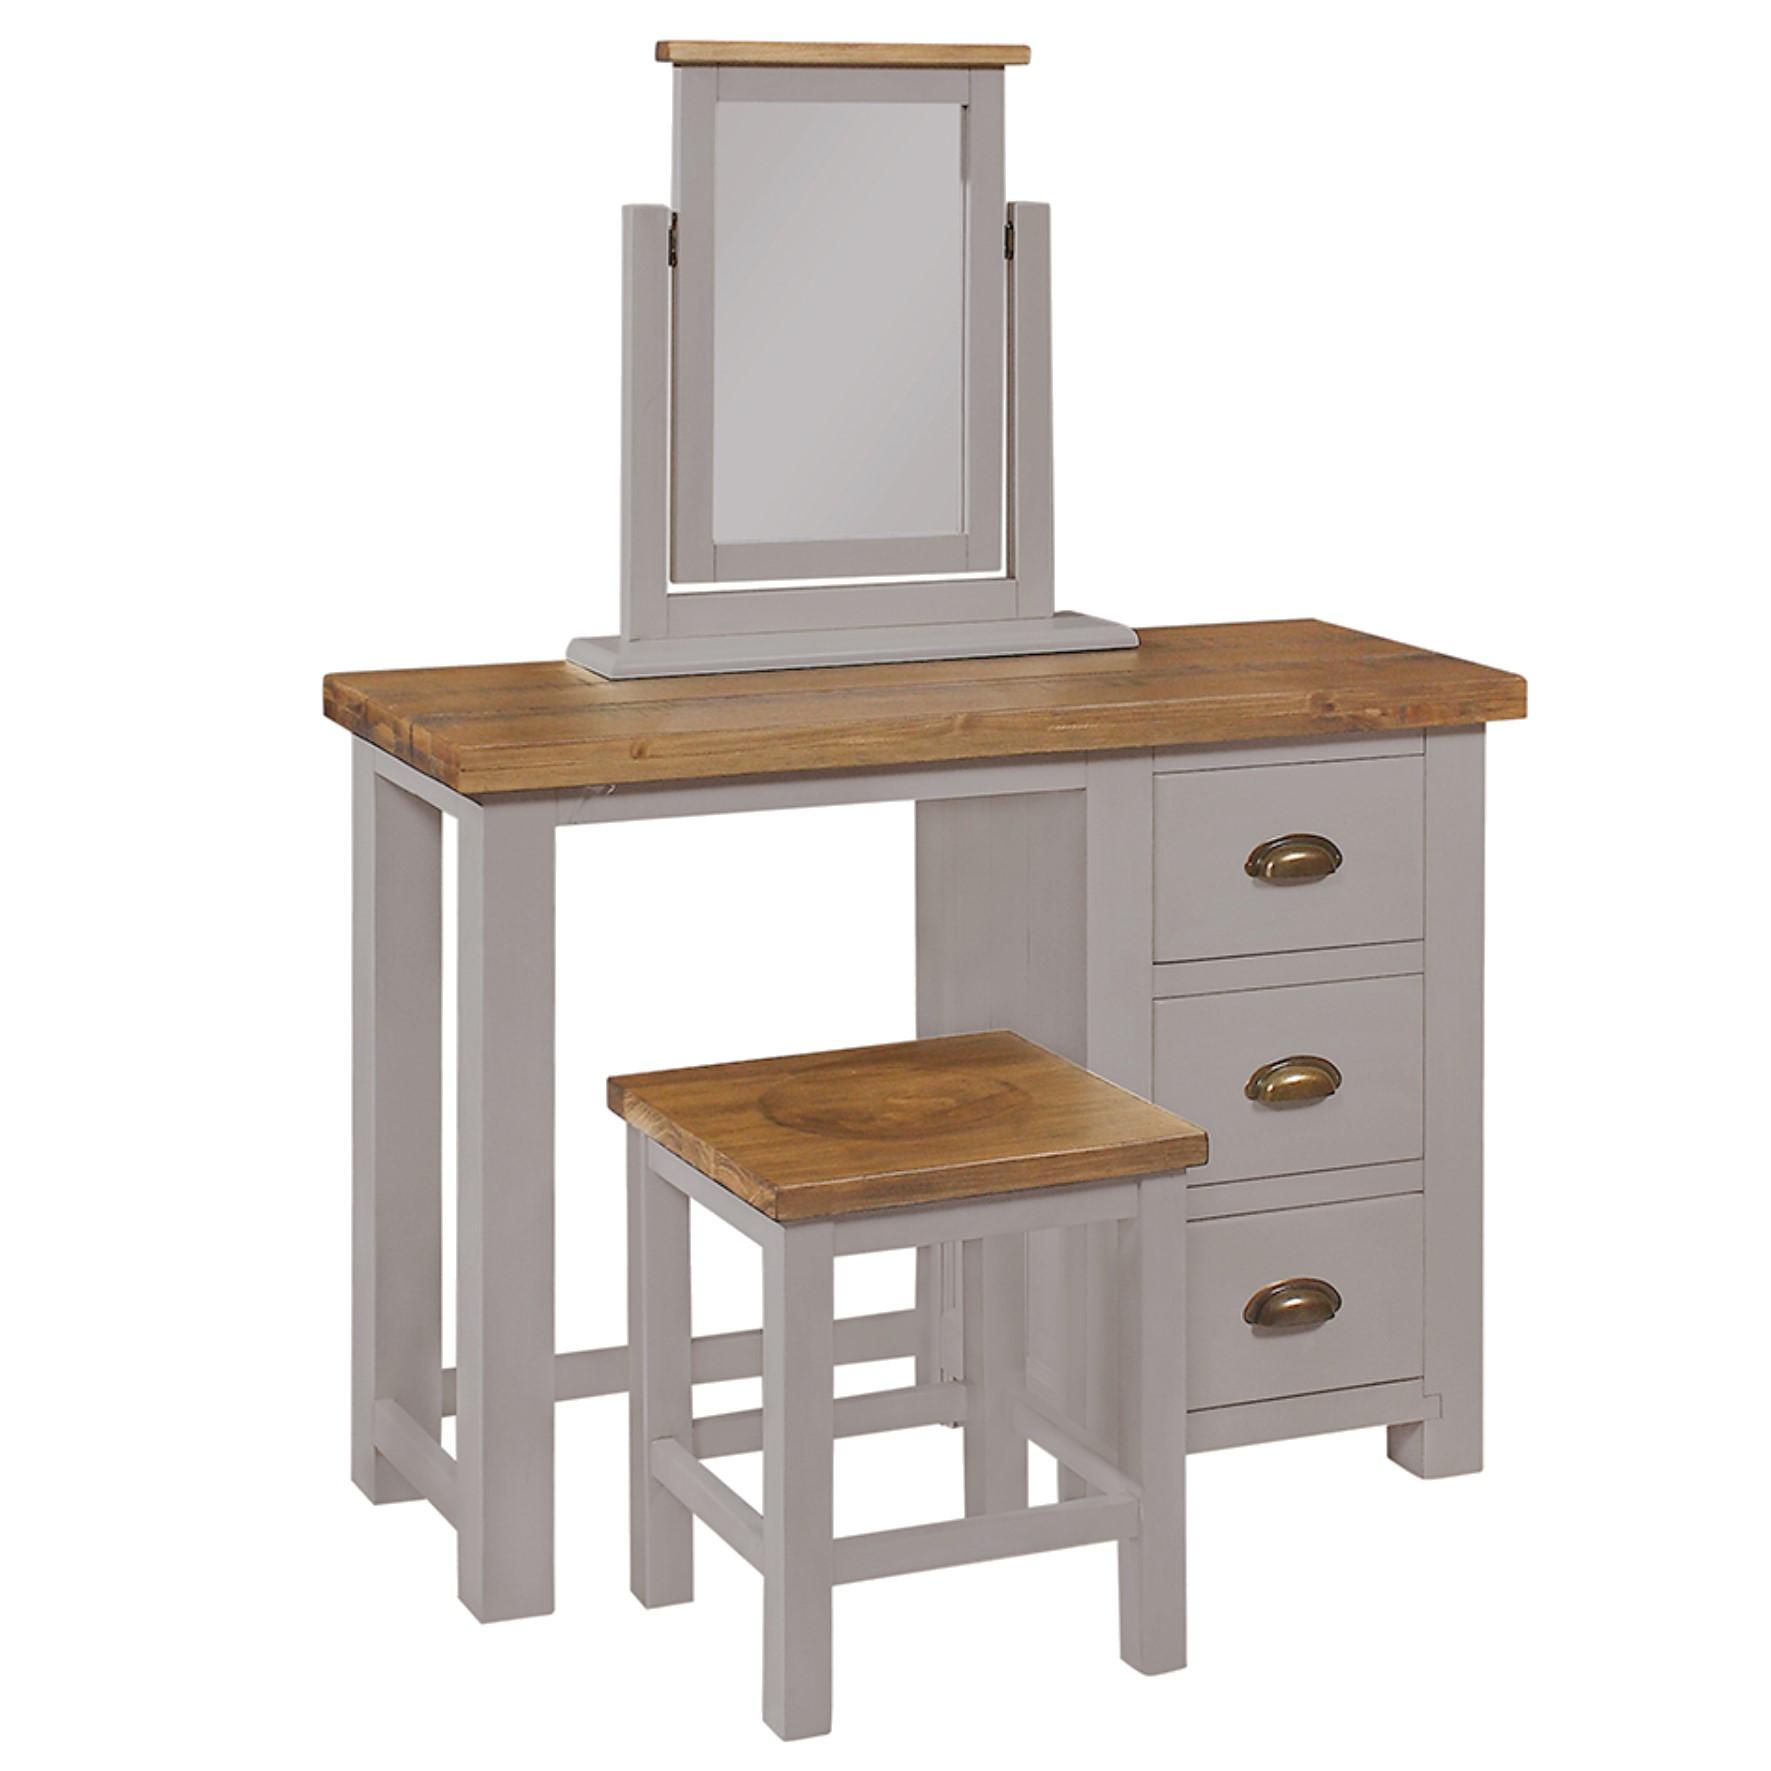 Charlton Grey - 3 Drawer Dressing Table